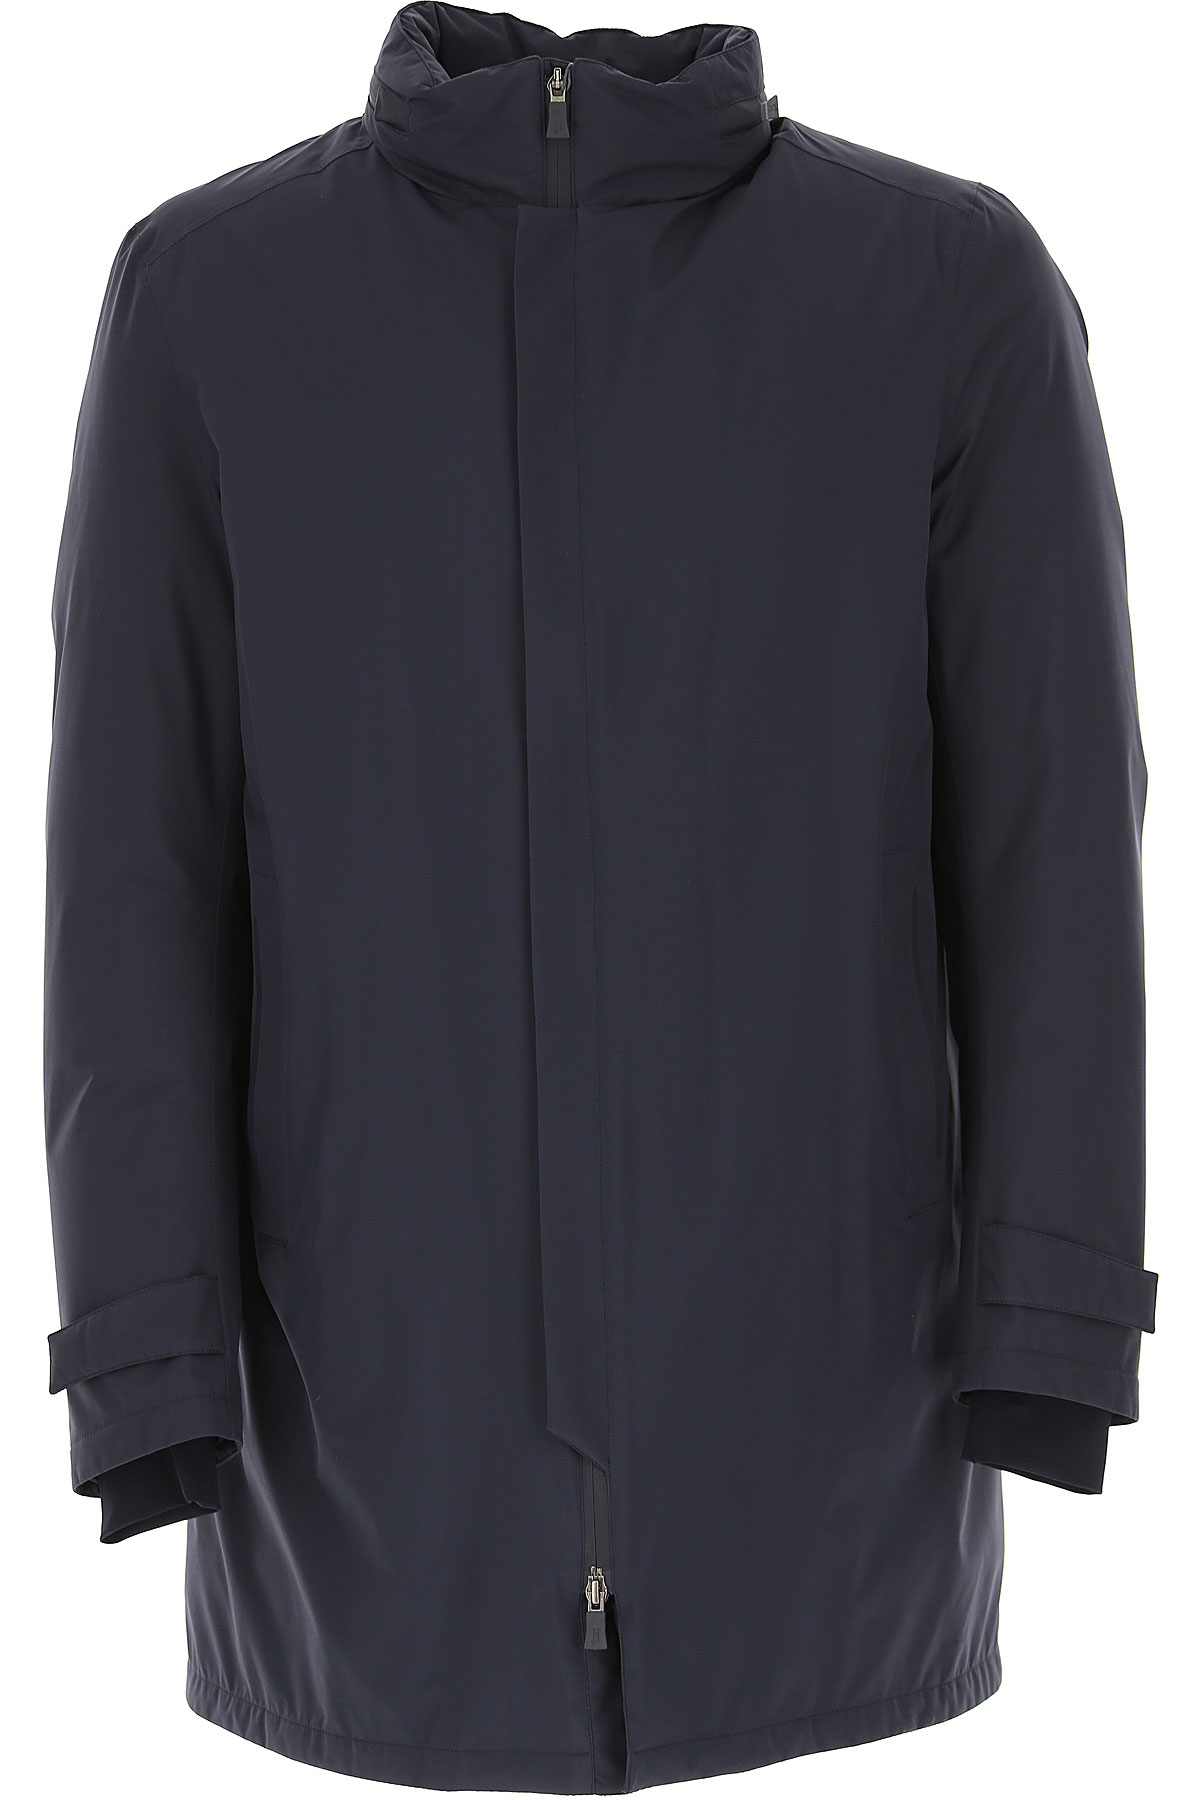 Herno Down Jacket for Men, Puffer Ski Jacket On Sale, Blue, polyester, 2019, L M XL